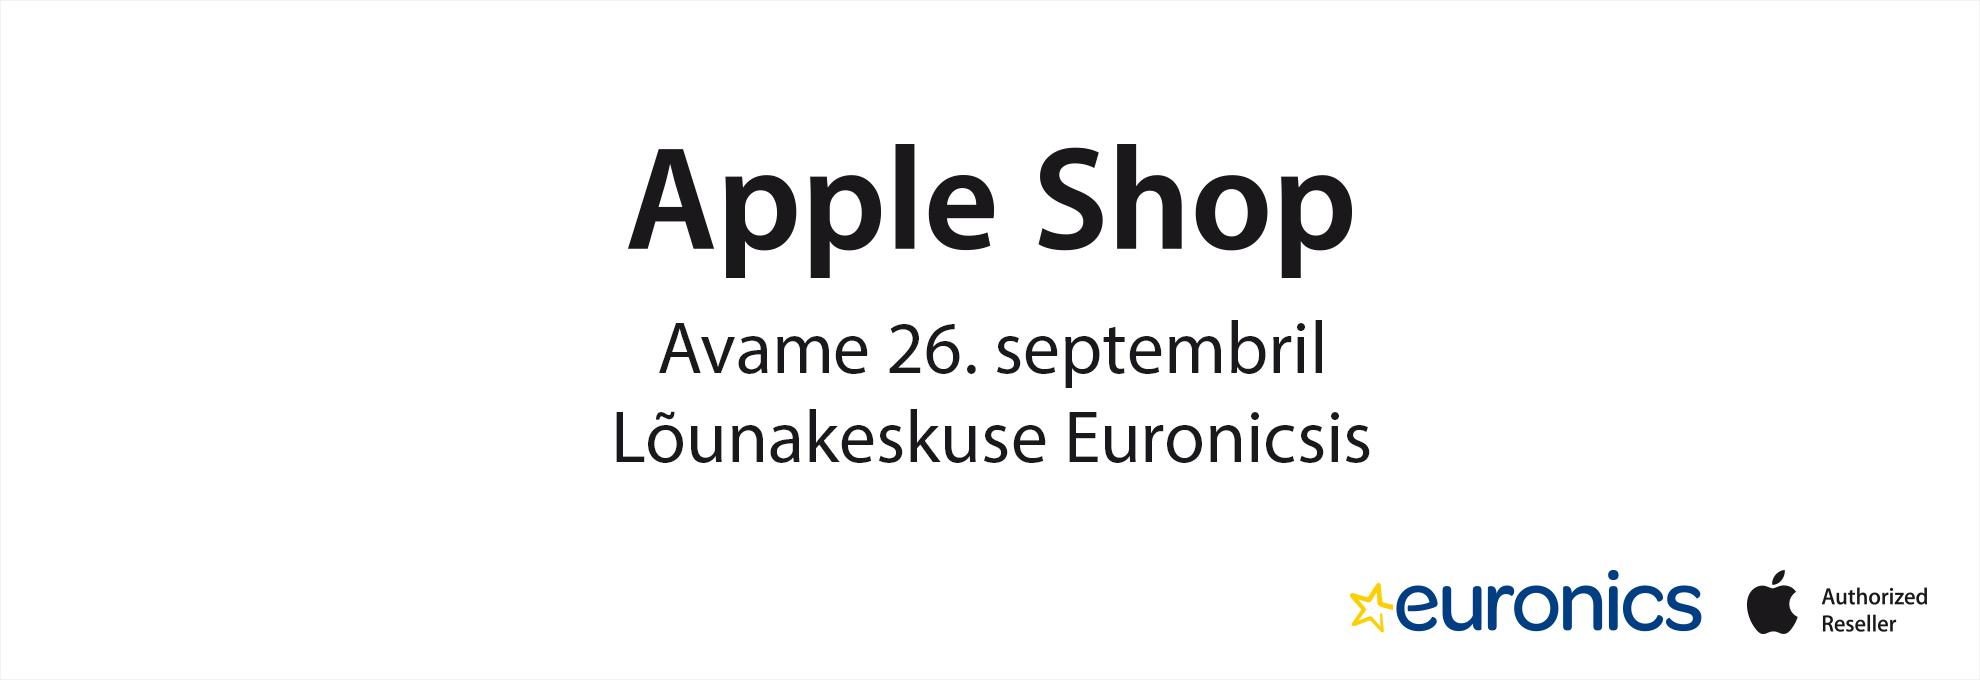 Apple Shop Lõunakeskuse Euronicsis